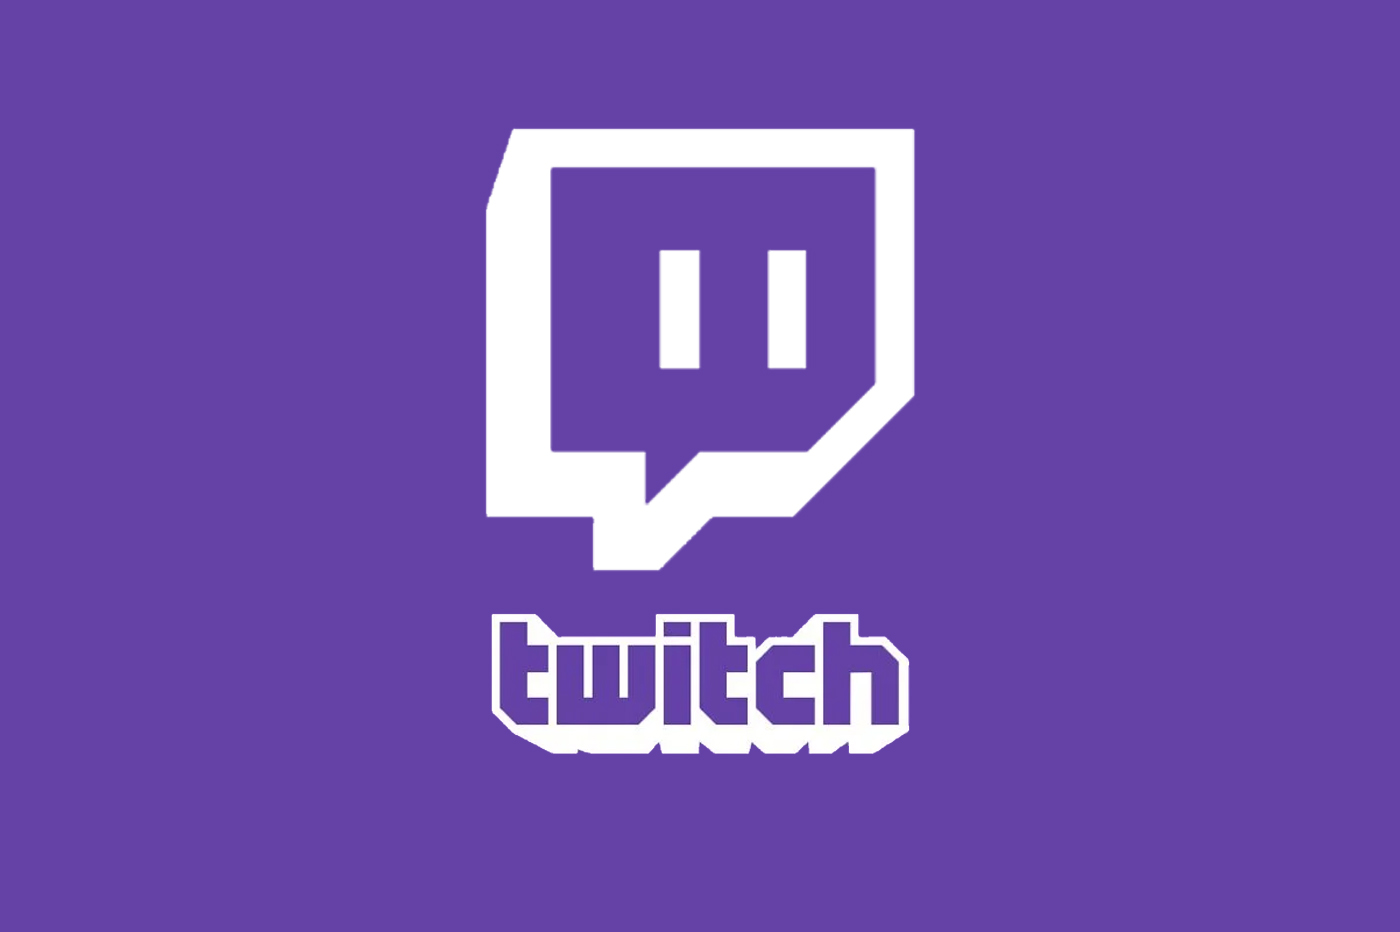 Fiche Twitch